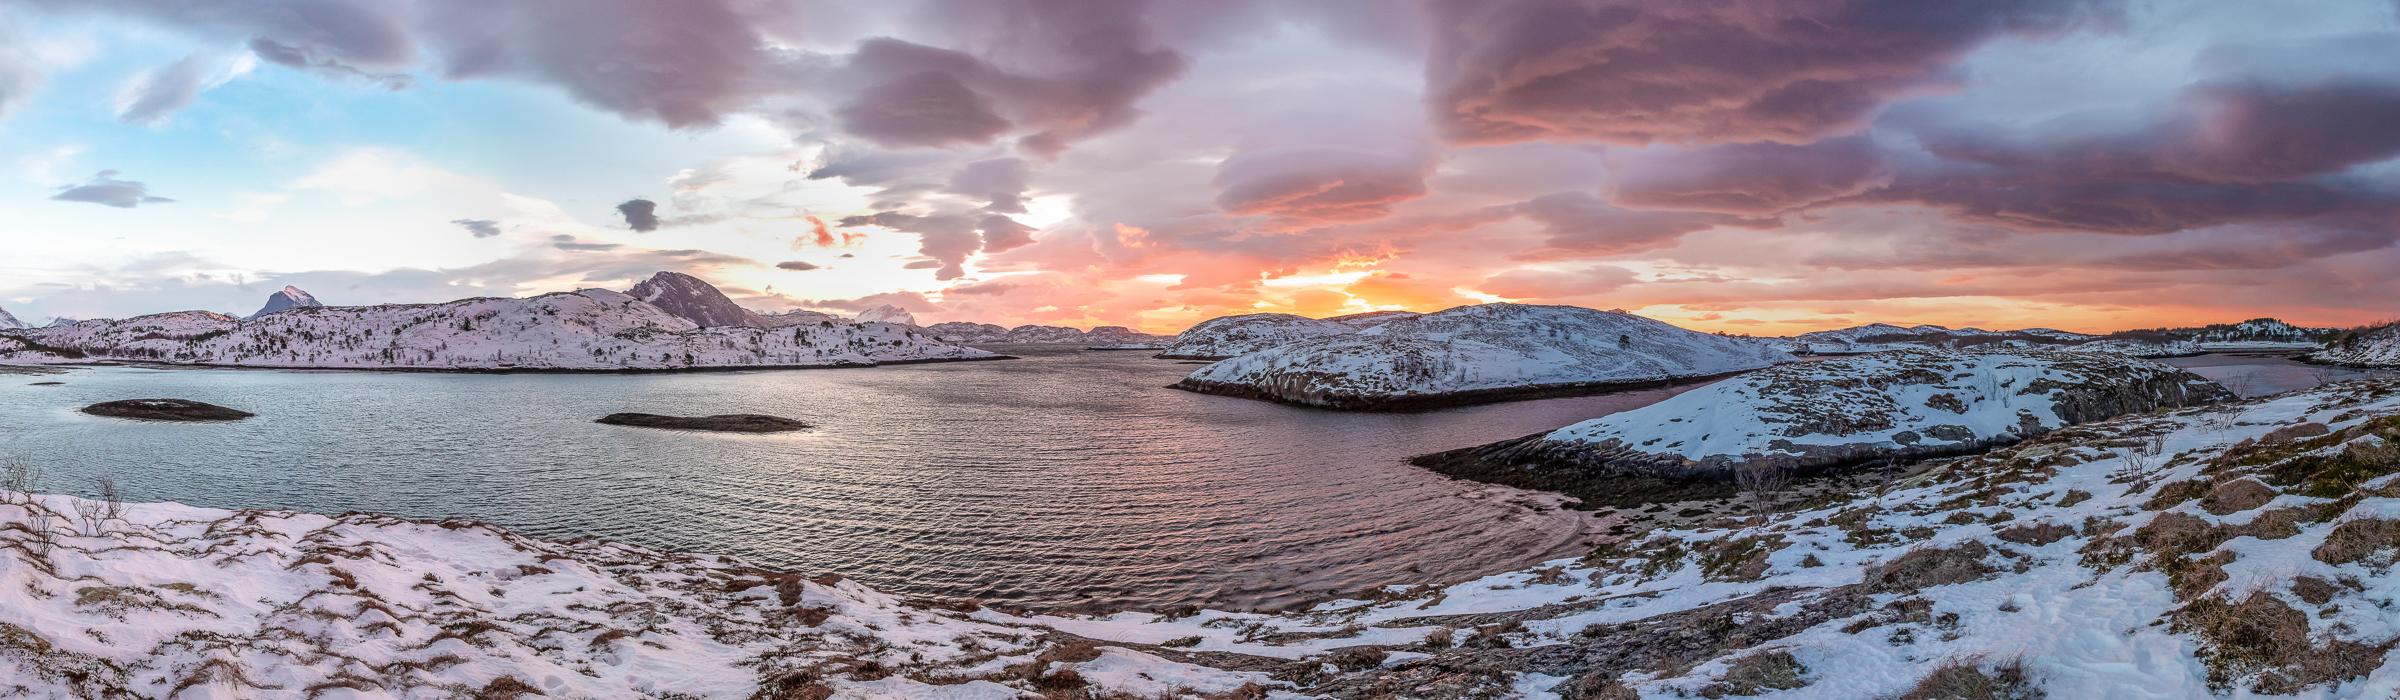 Sonnenuntergang an der Tjongsfjord Lodge